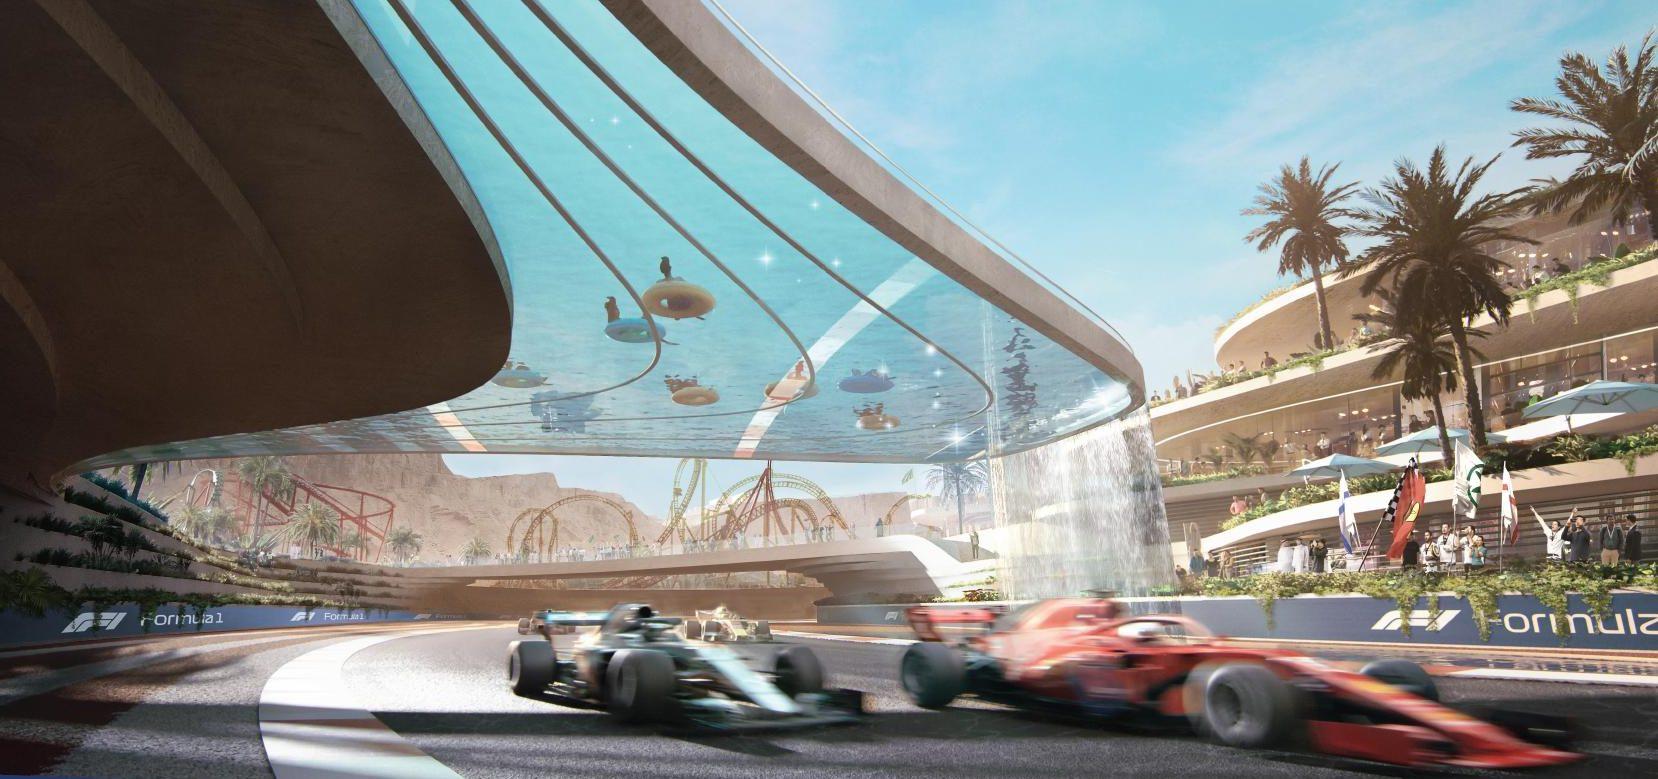 Vidéo : Qiddiya, un projet gigantesque avec un circuit de F1 en plein milieu 1